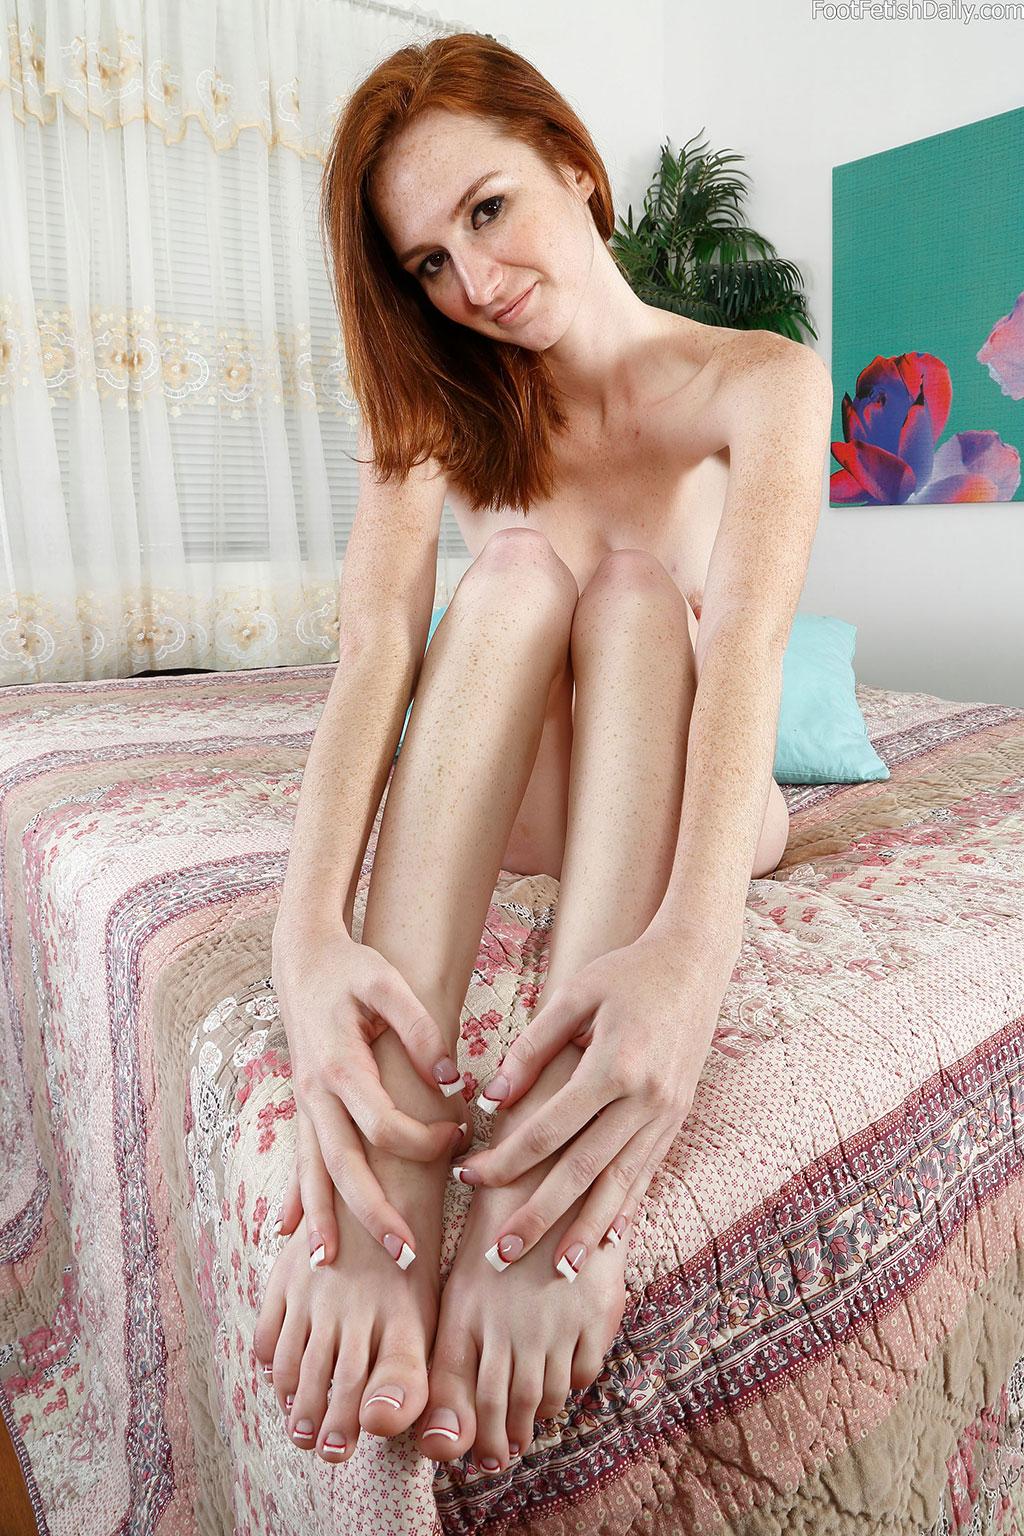 andrew luster soft porn